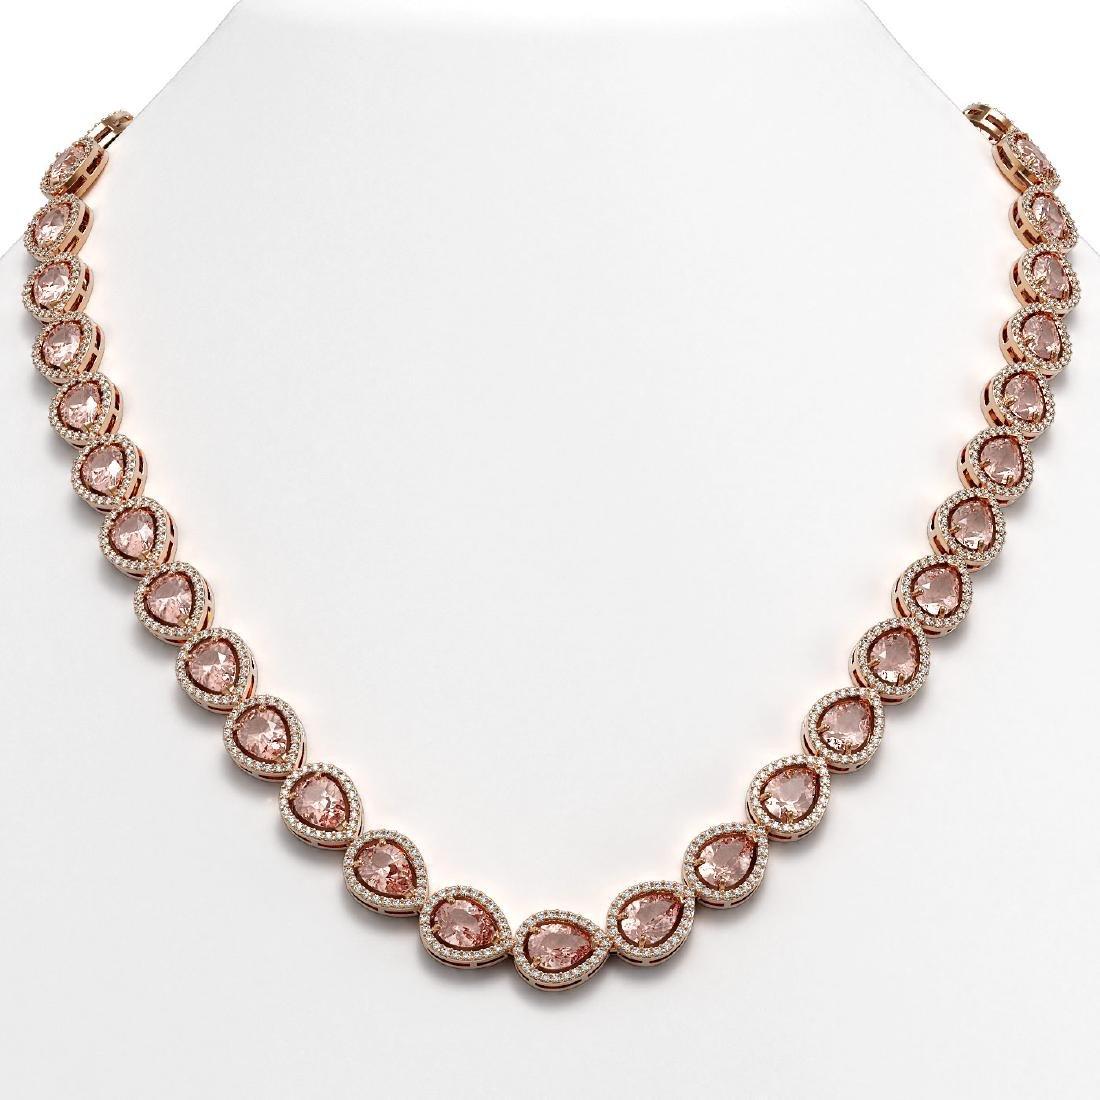 35.13 CTW Morganite & Diamond Halo Necklace 10K Rose